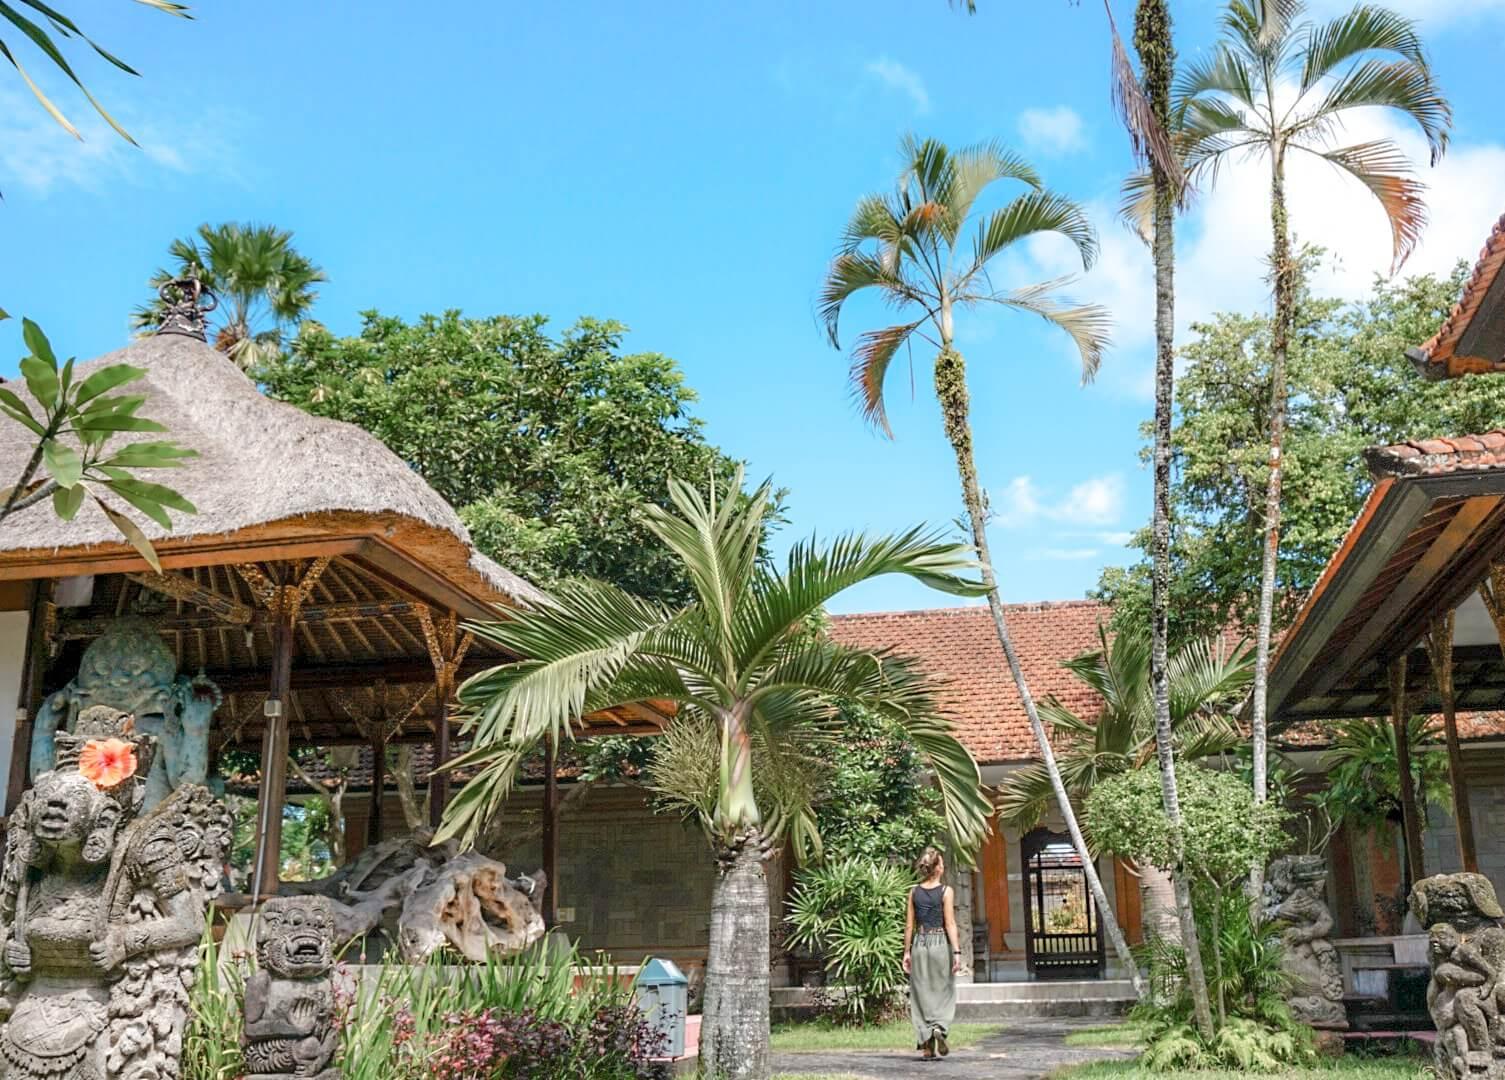 La magie des Décors balinais Ubud Bali